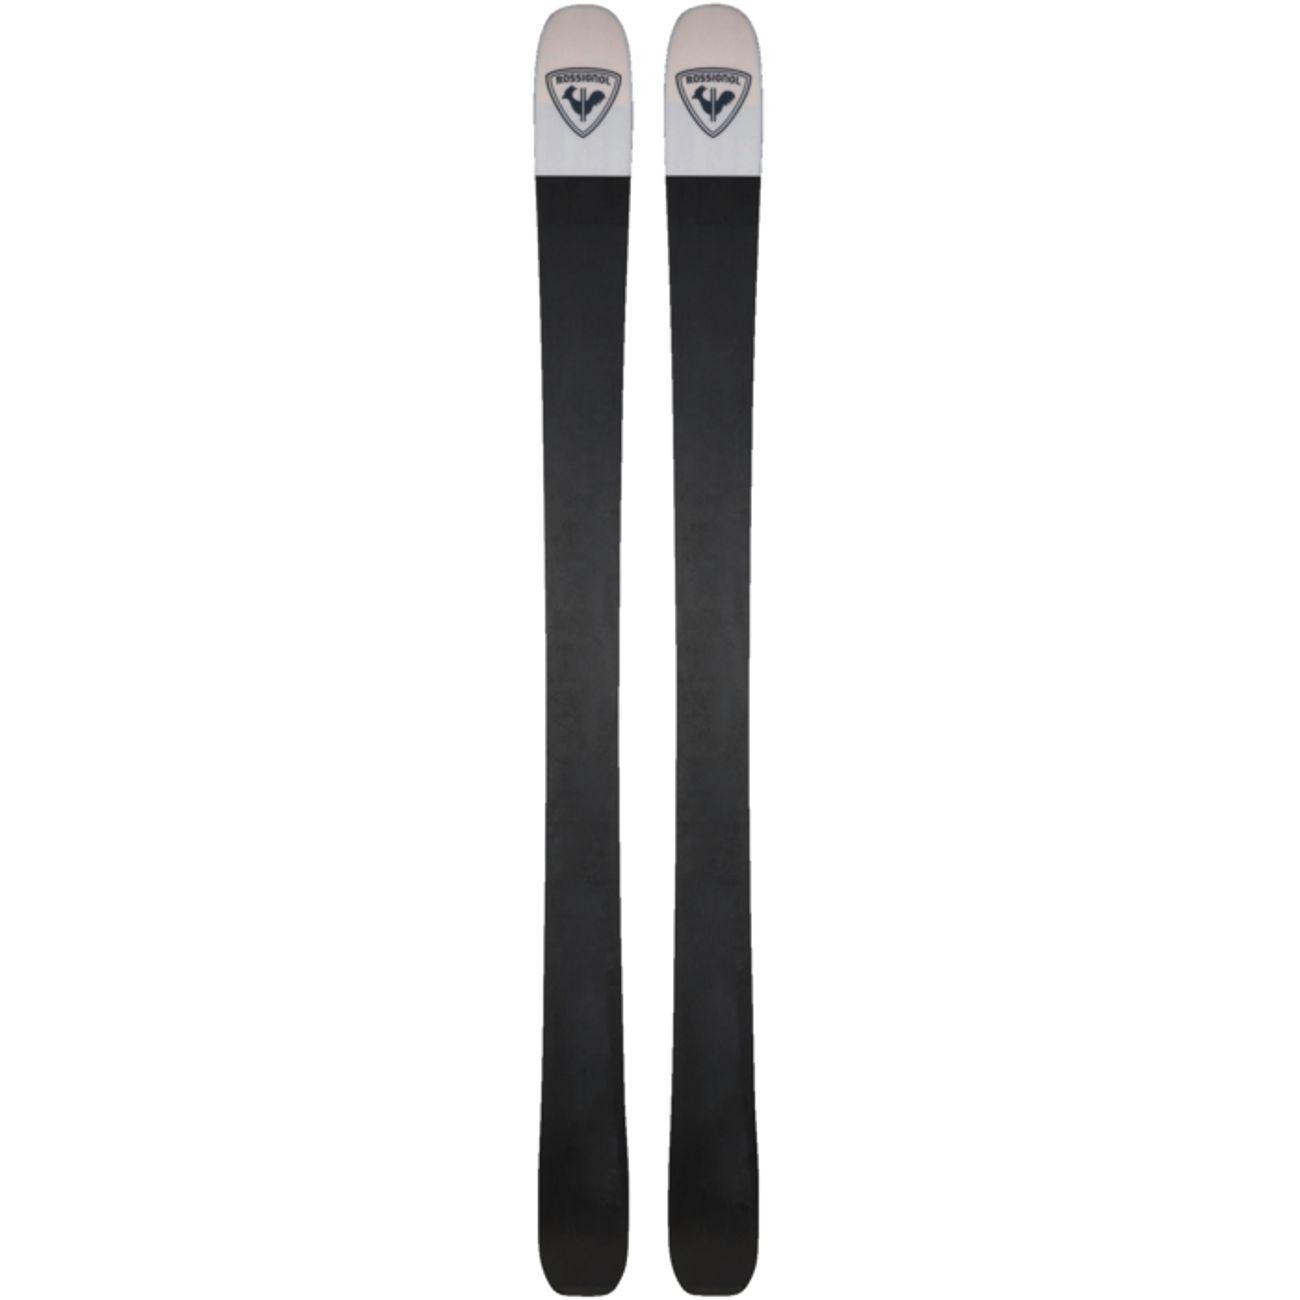 SKIS Ski adulte ROSSIGNOL BLACKOPS SENDER (OPEN) SPX 12 GW B1